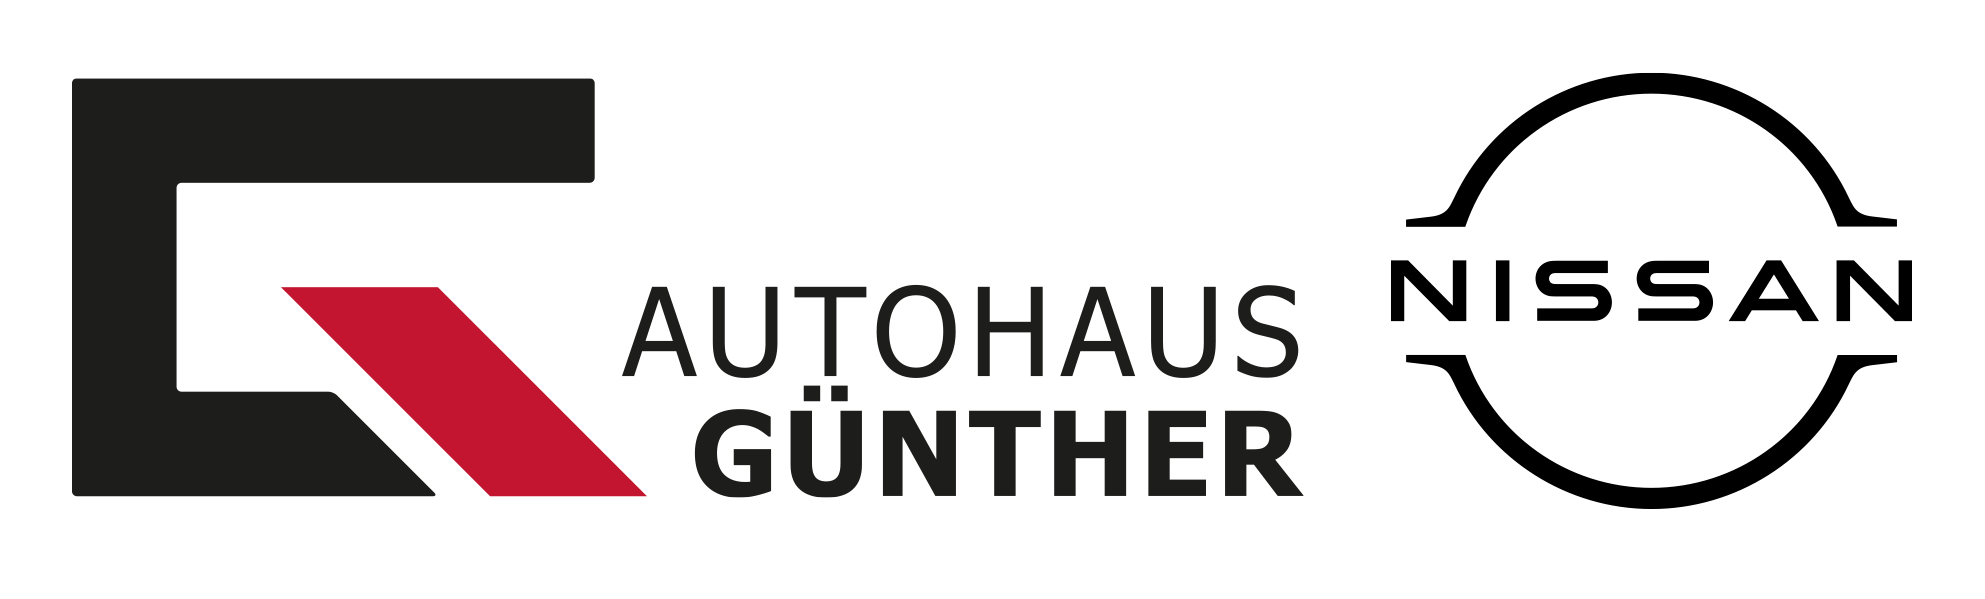 Autohaus Günther – Hamburgs größter Nissan Vertragshändler Logo